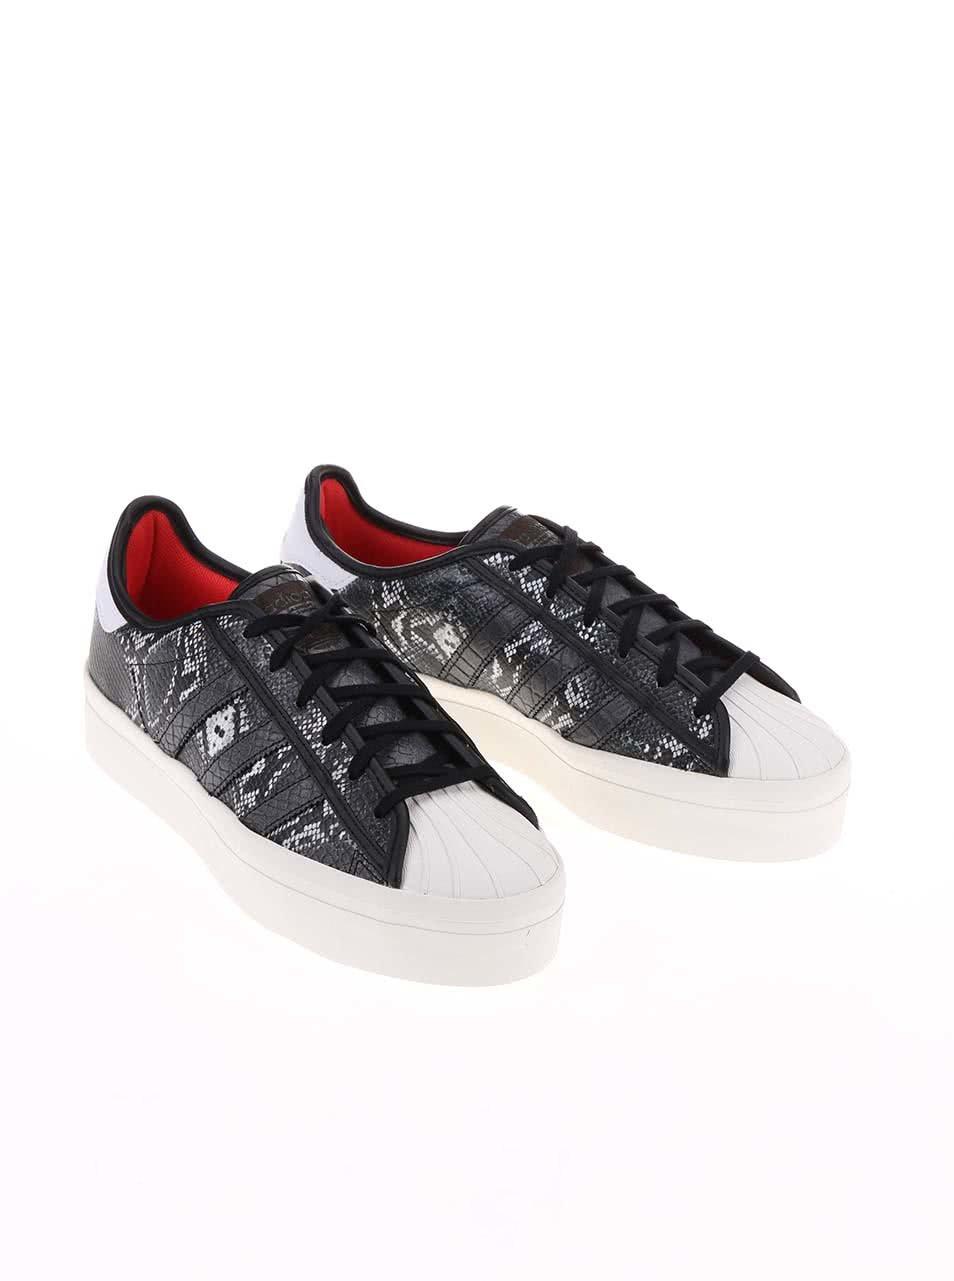 f1ad48ad7df4 Sivé dámske tenisky s hadím vzorom adidas Originals Superstar ...